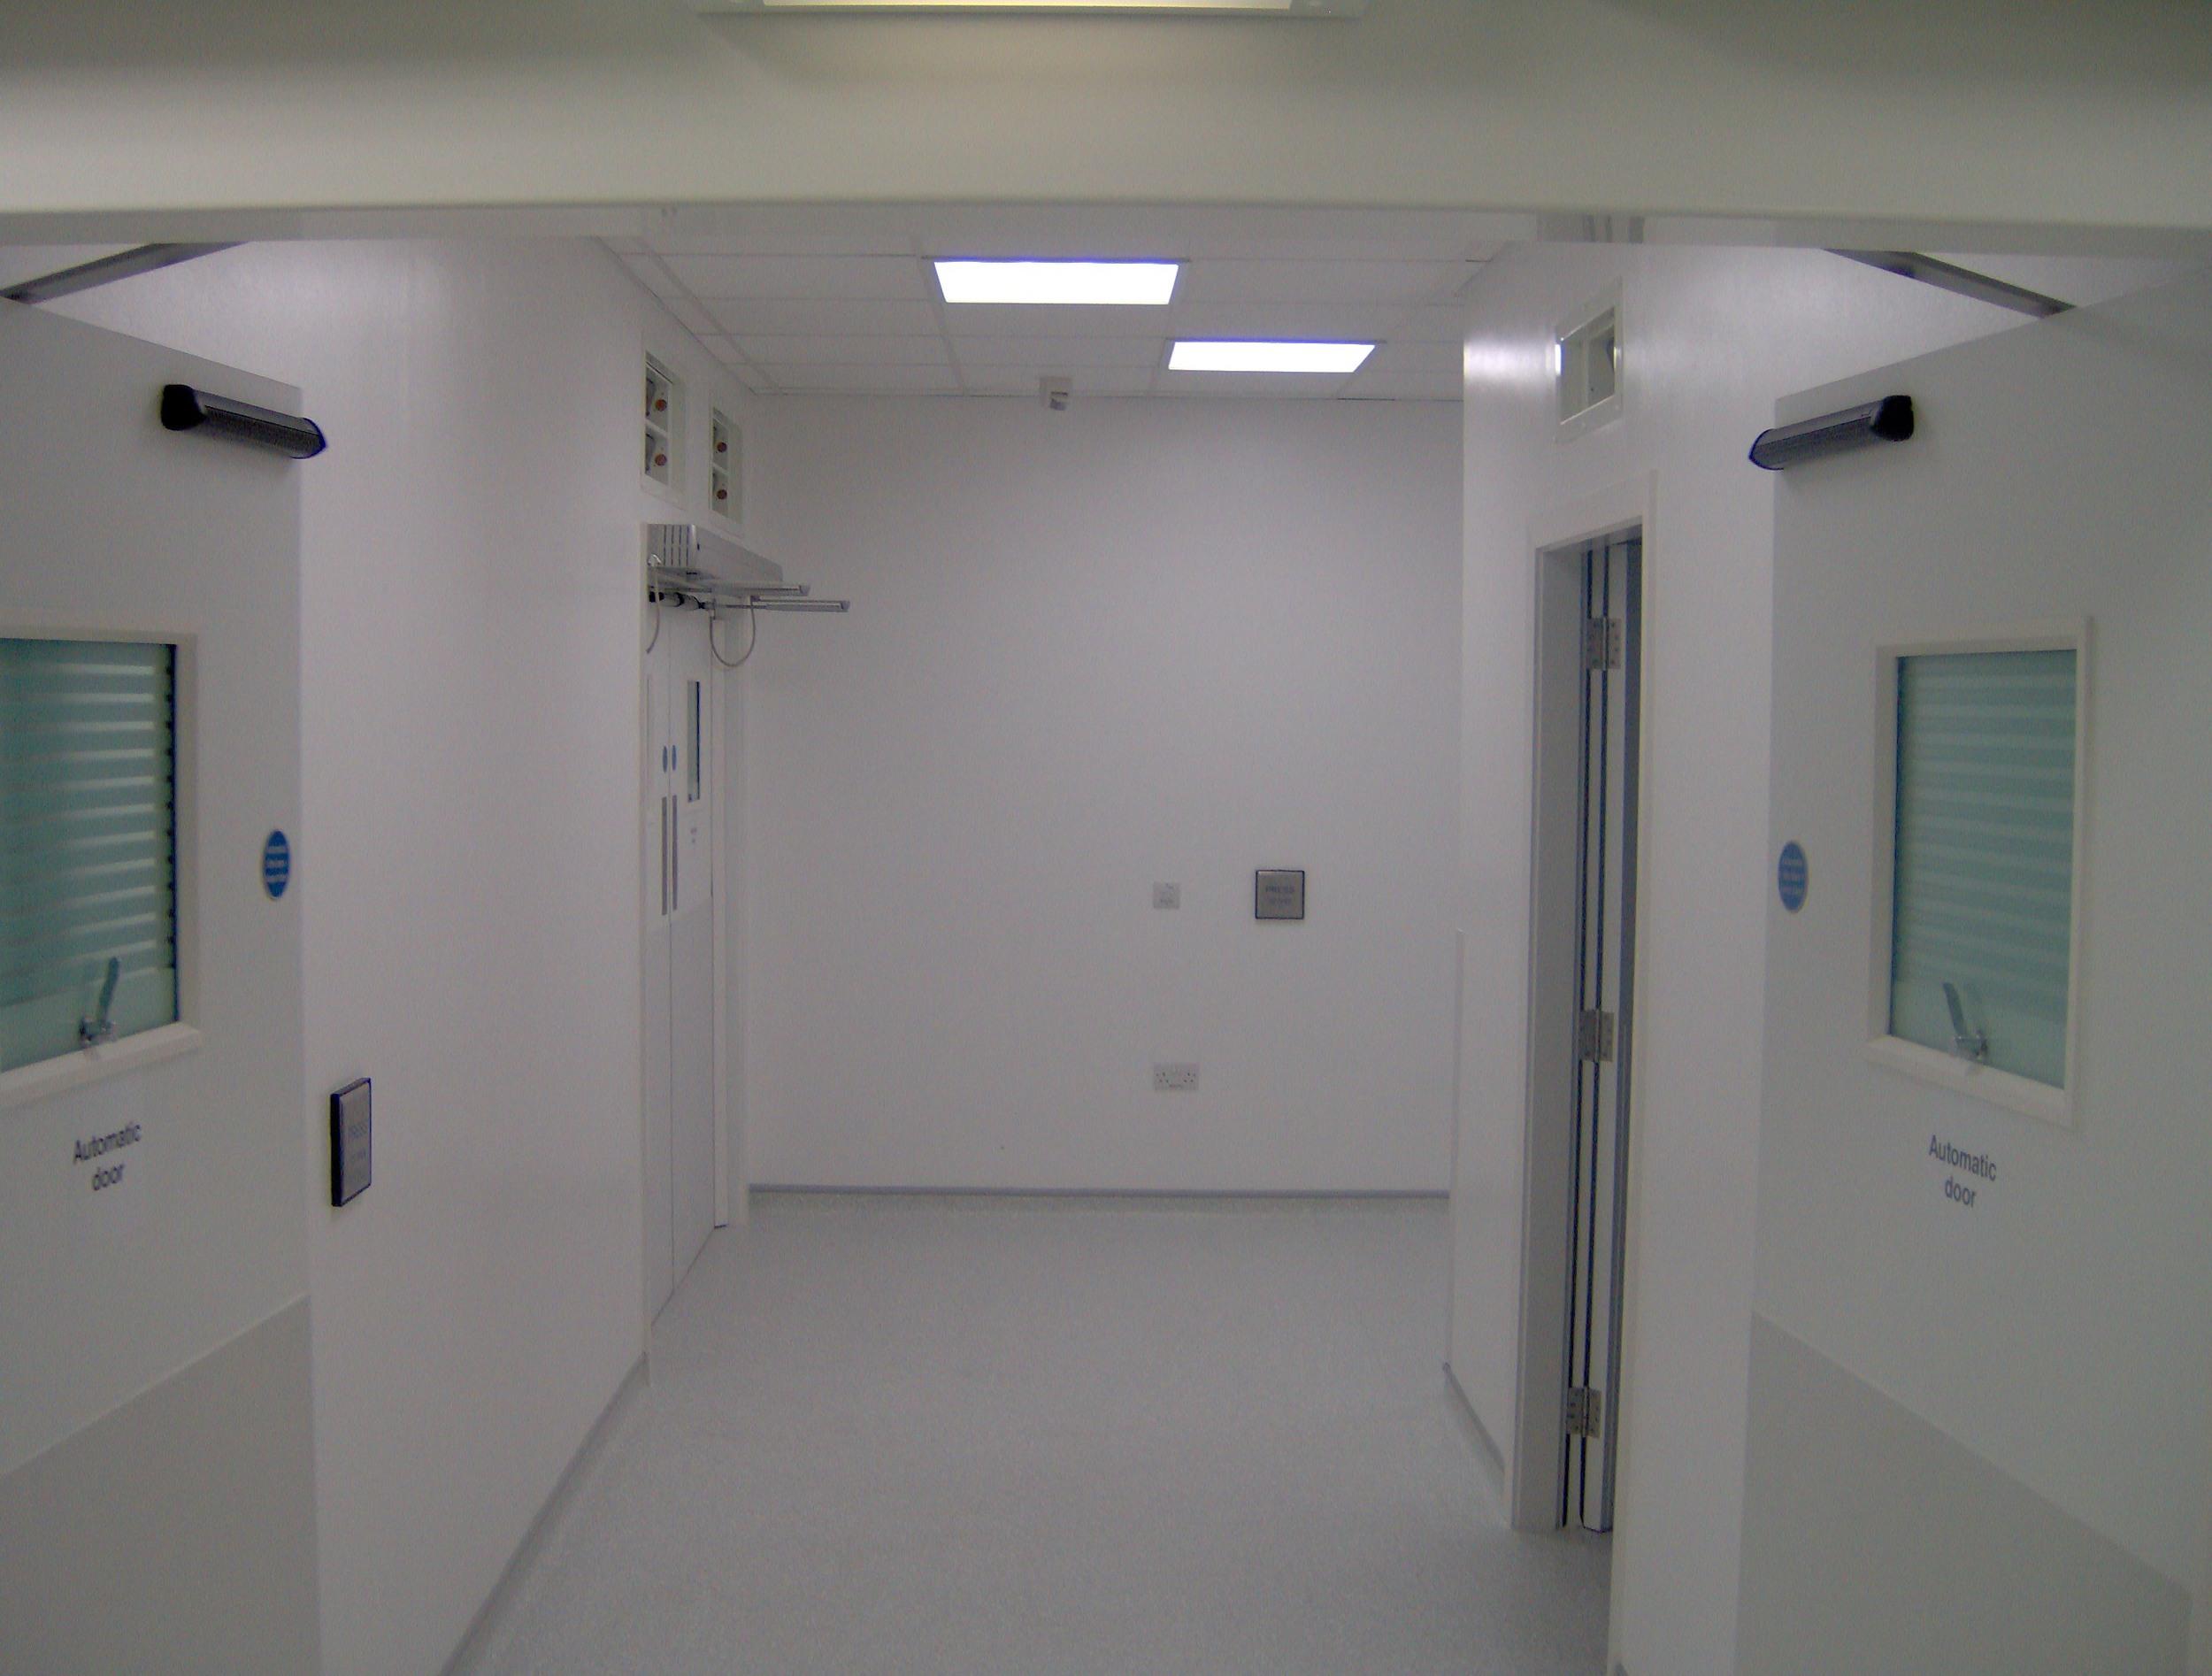 downe-hospital-2.JPG